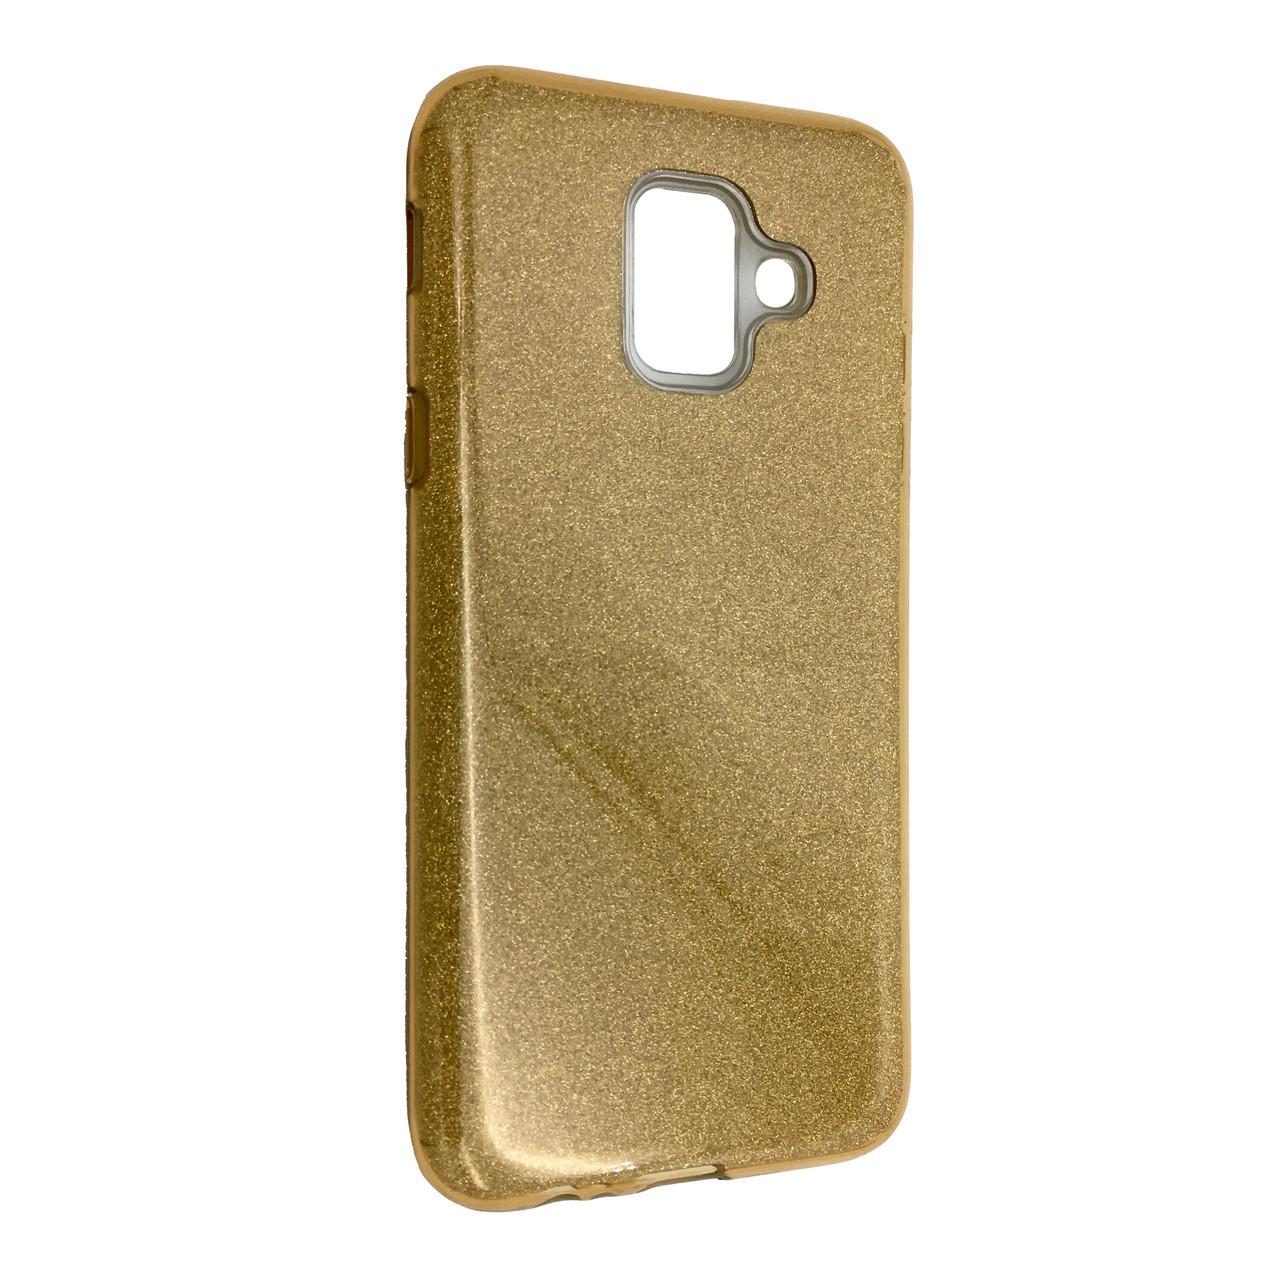 Чехол Silicone Glitter Heaven Rain Samsung J600 (2018) (gold)